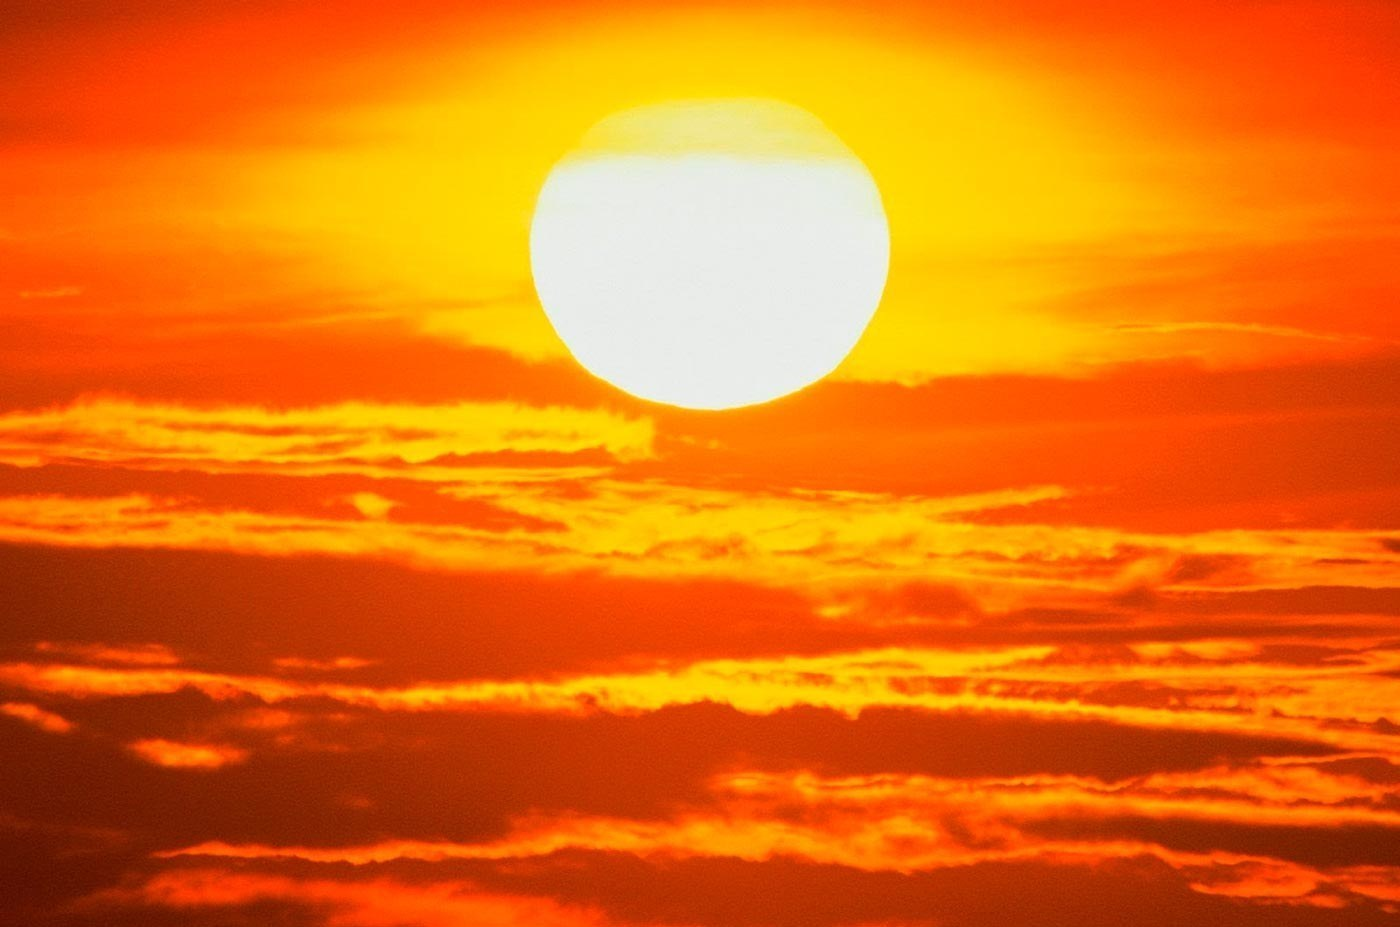 В Узбекистане установилась аномальная жара